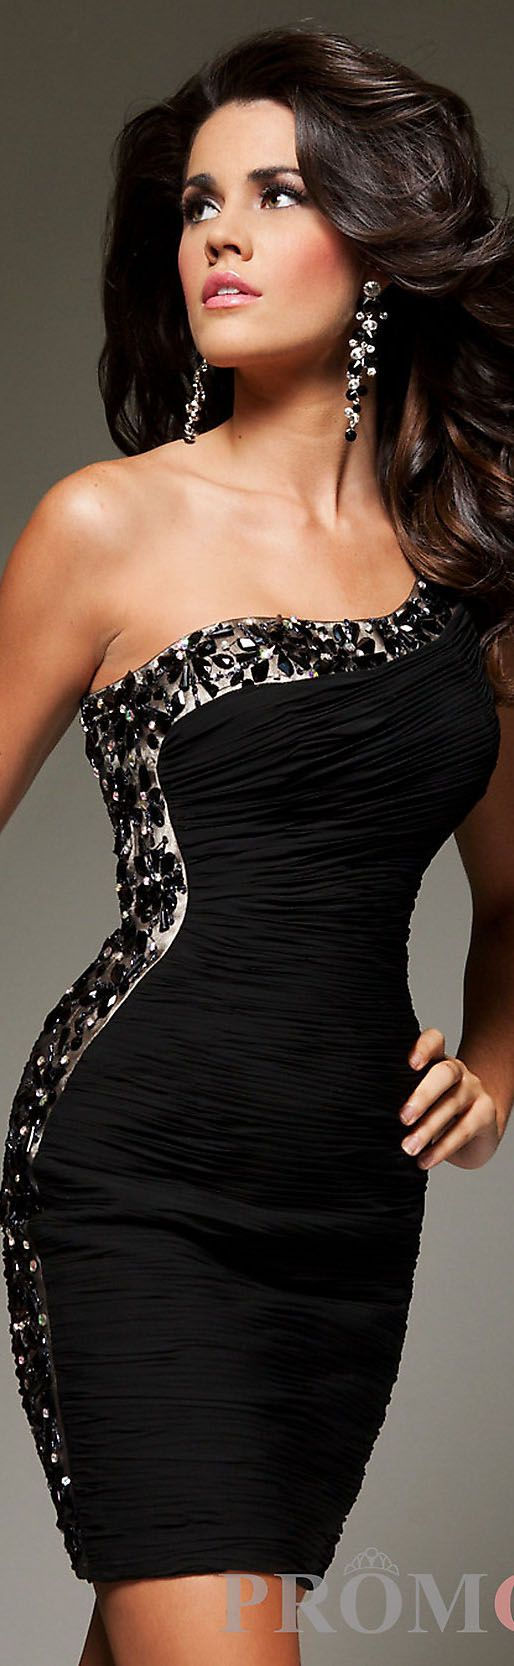 Sexy mini dress, one shoulder, black